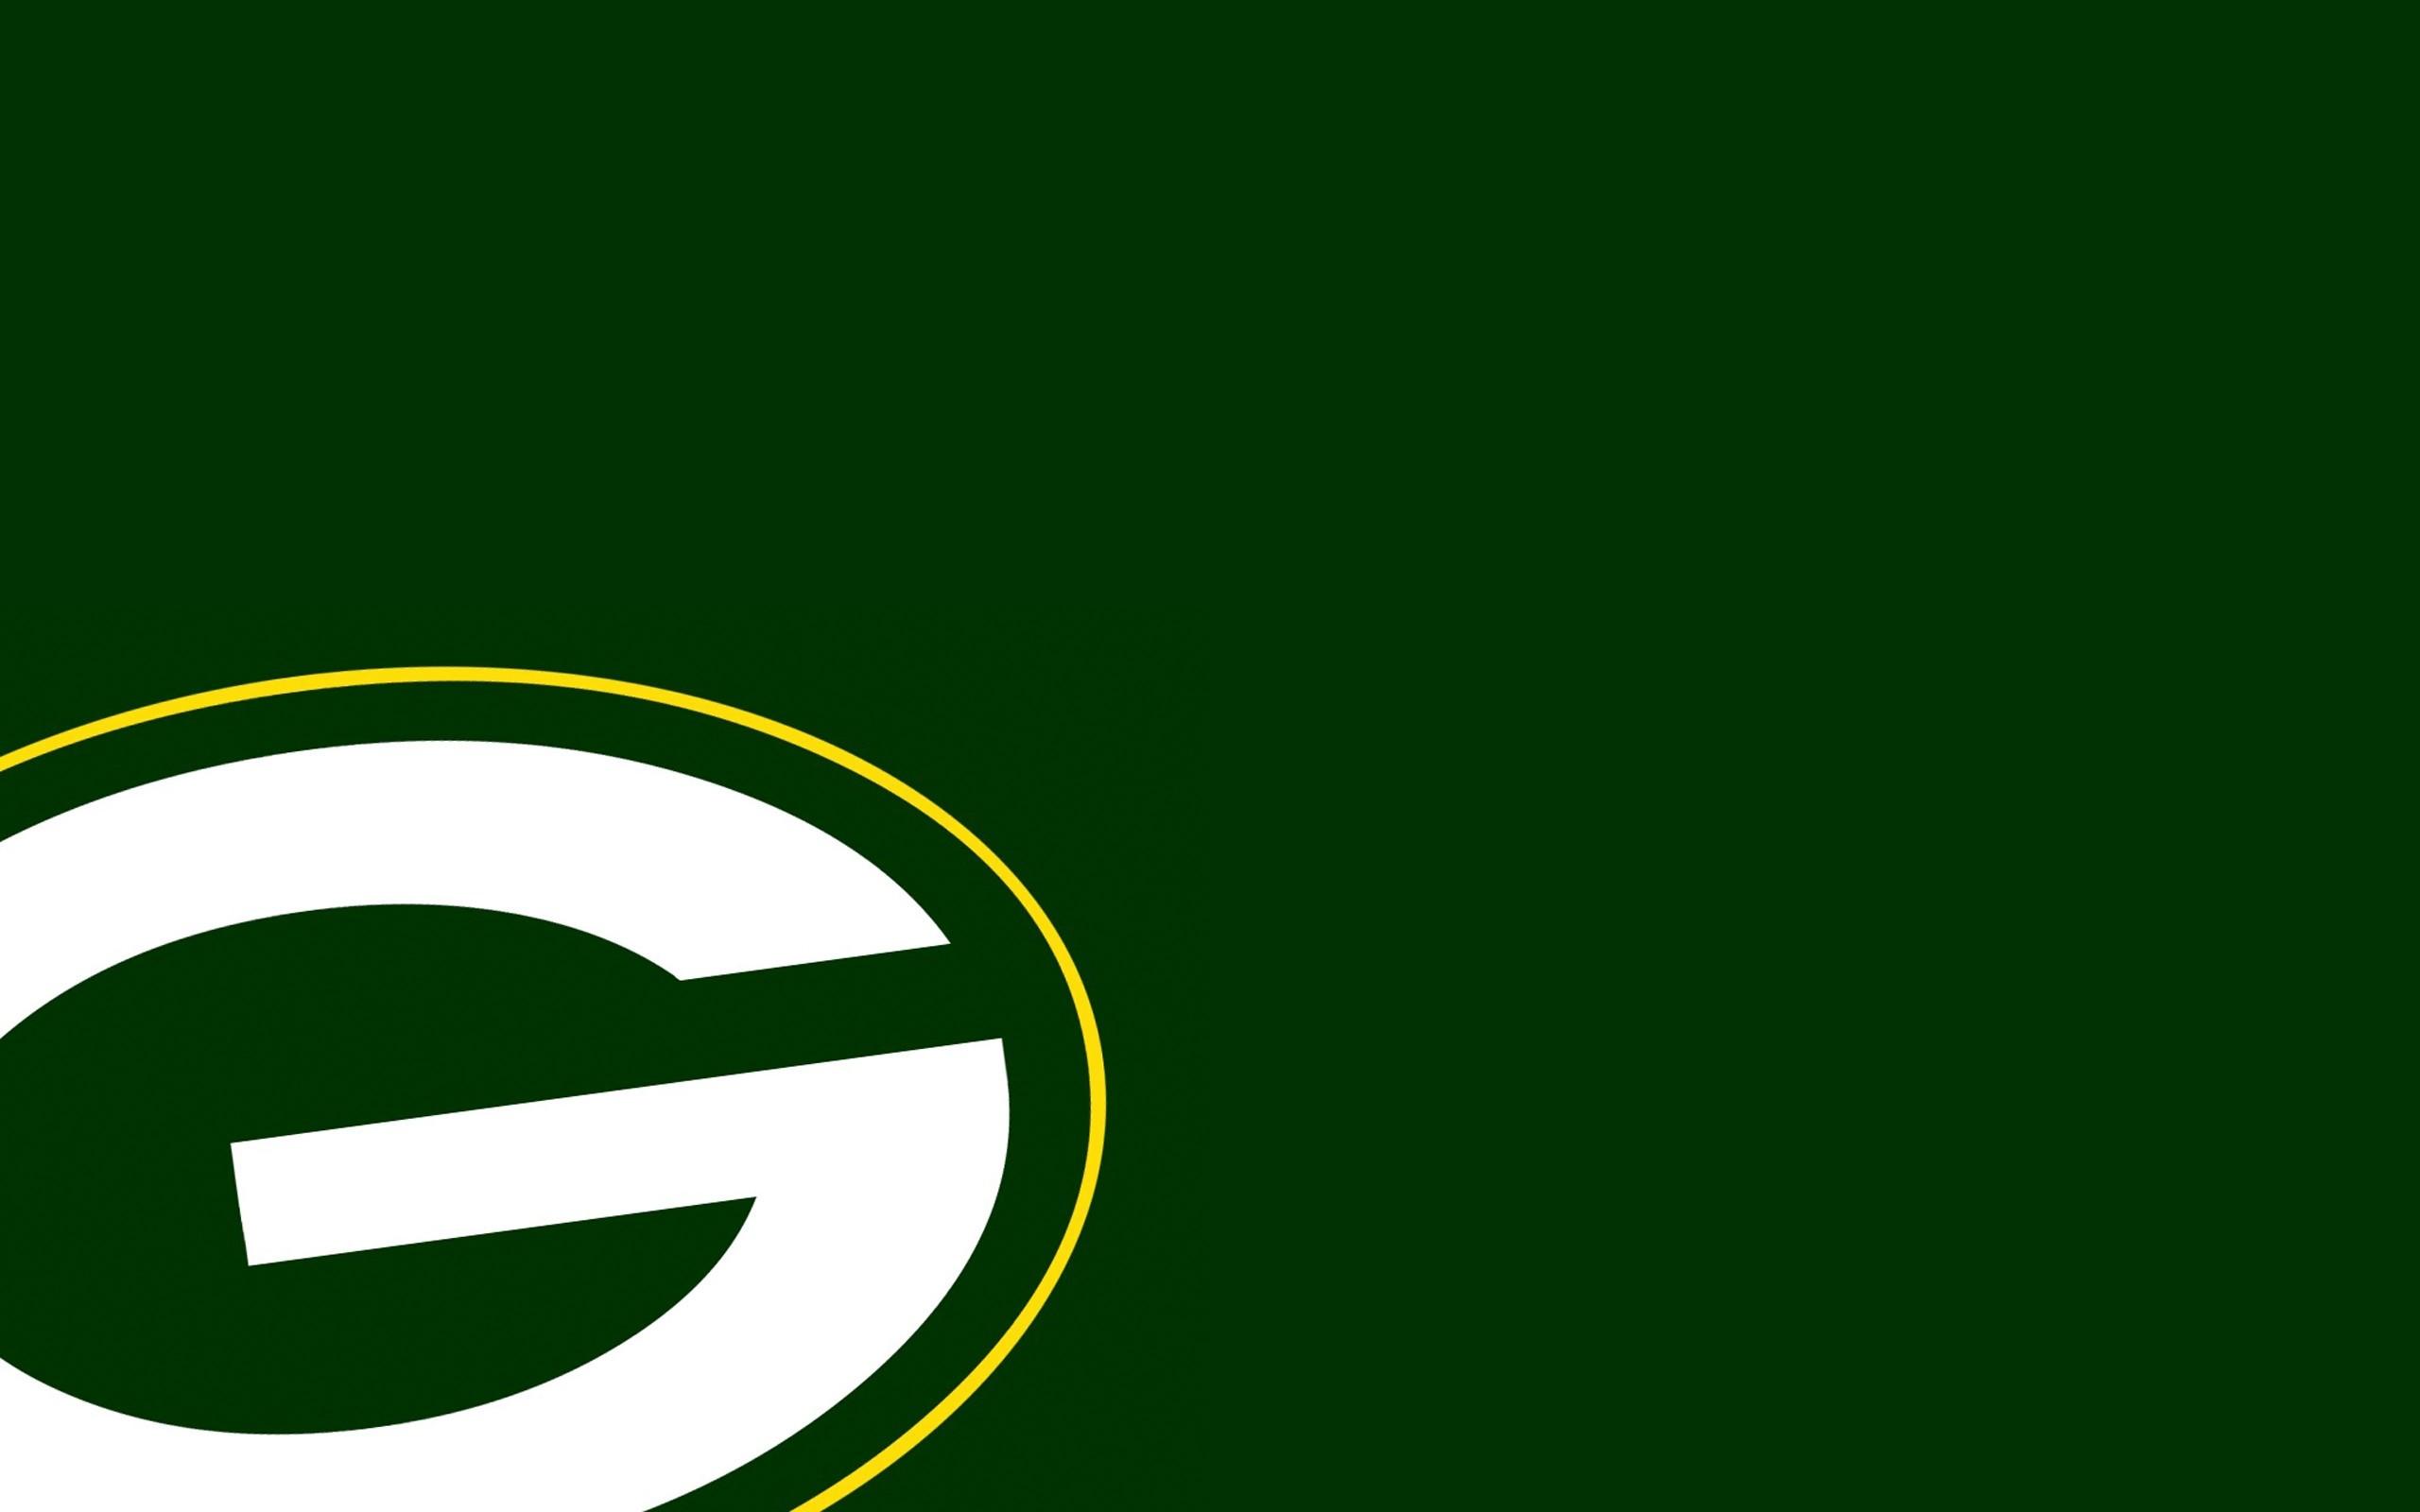 Green Bay Packers Wallpaper 22660